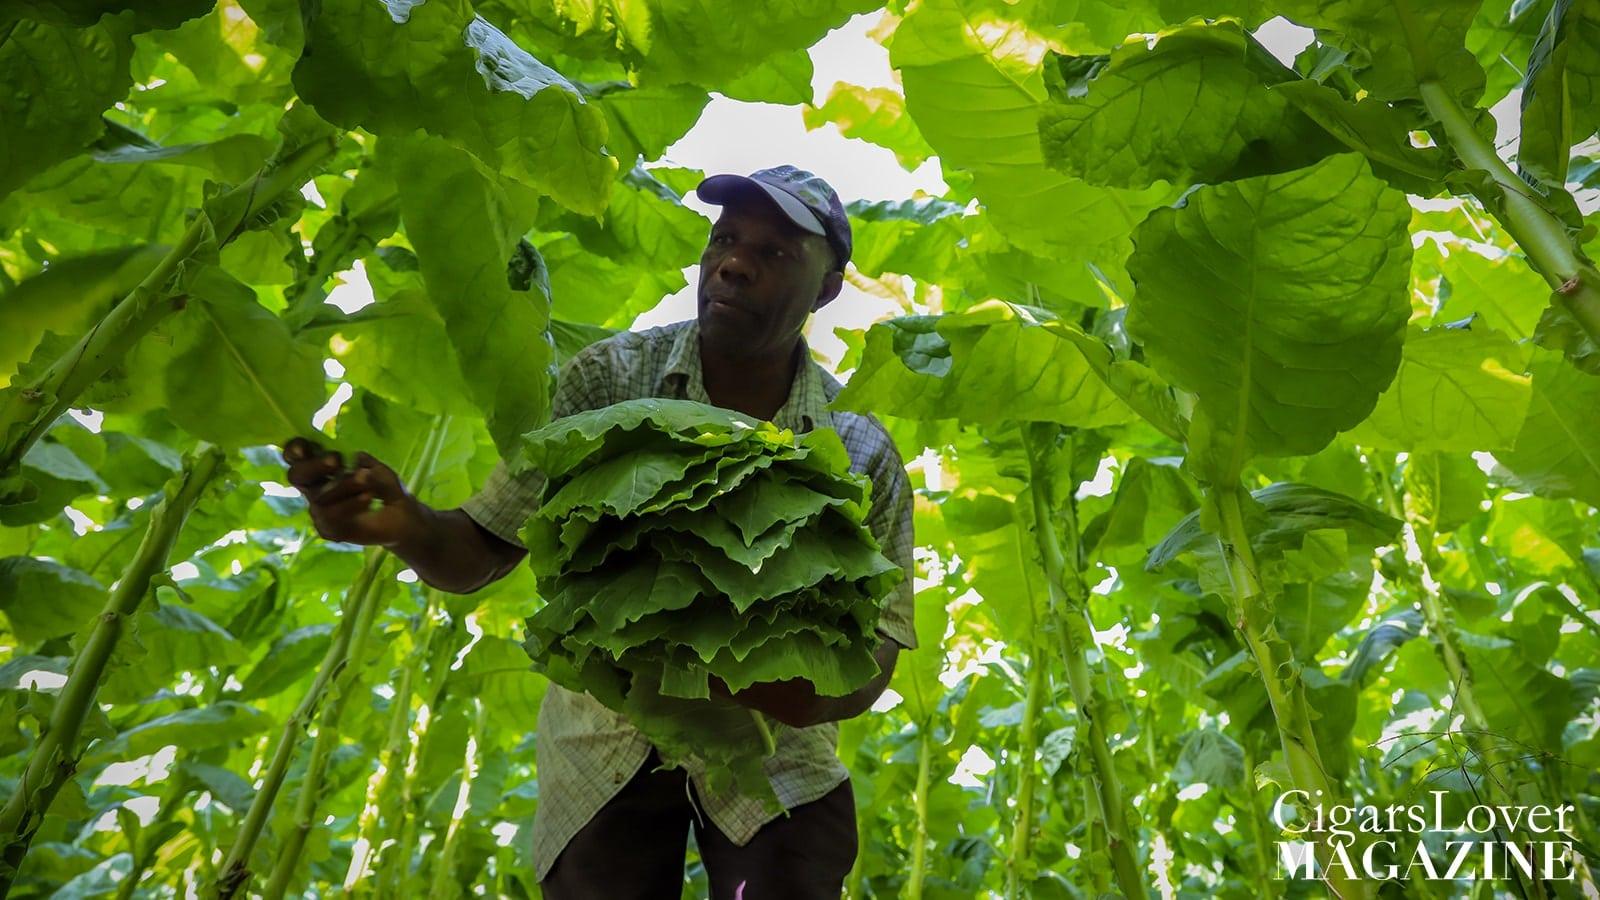 picking_tobacco_leaves-min